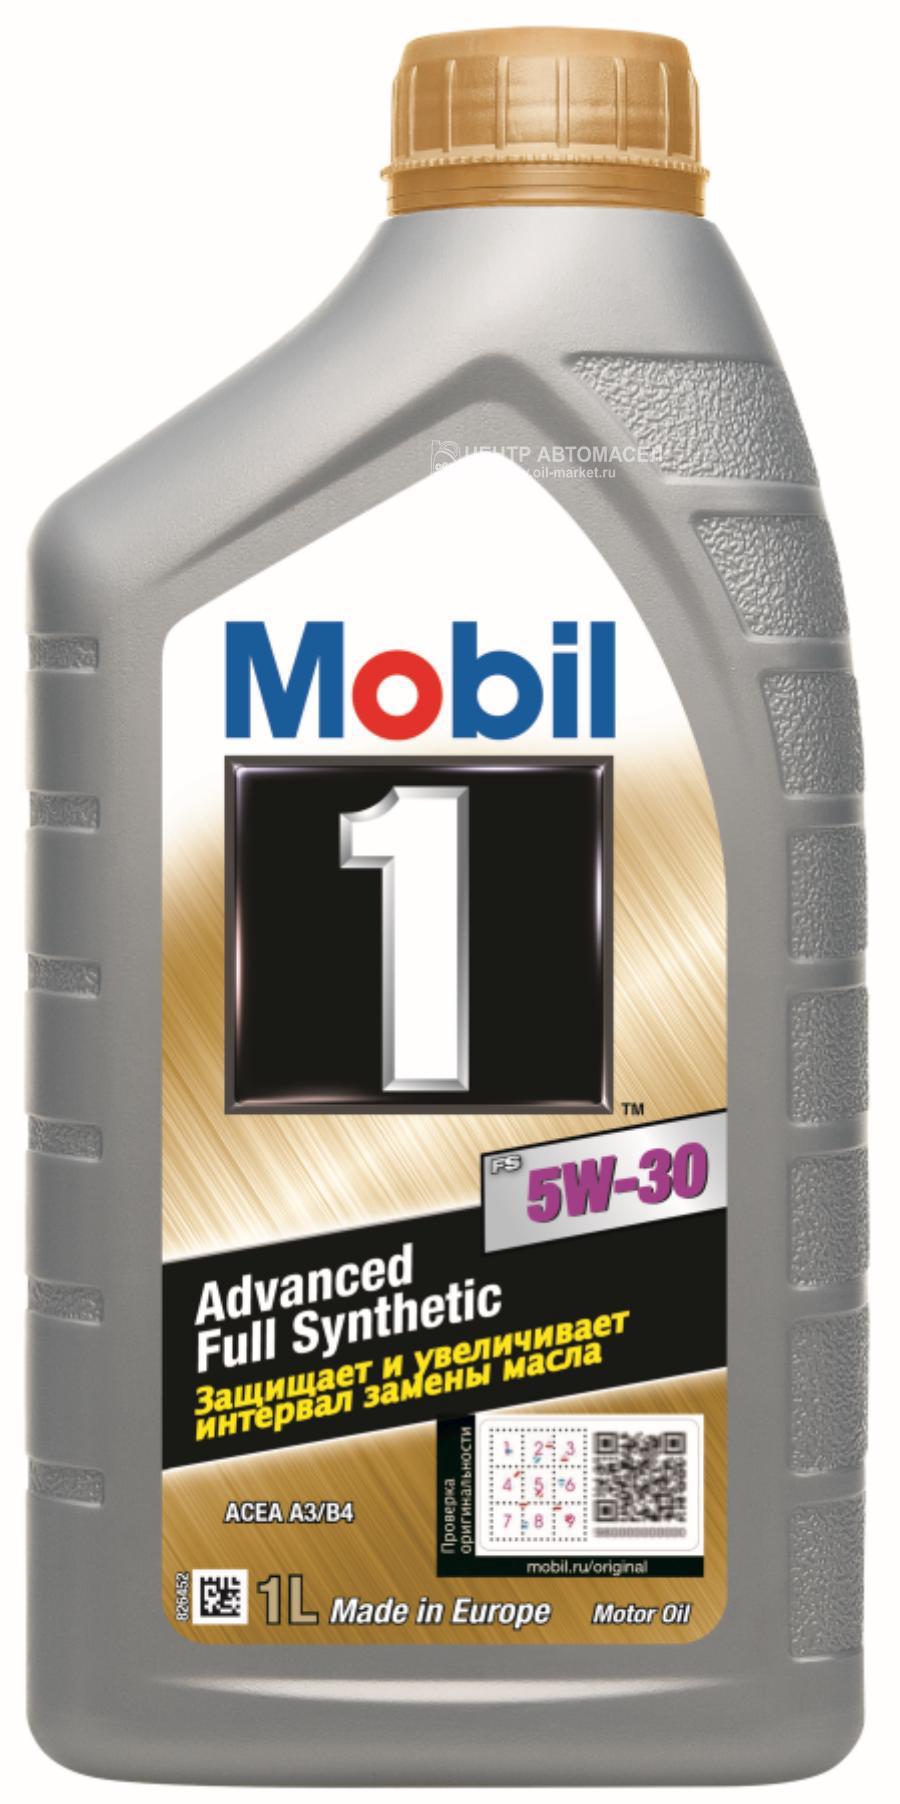 Mobil 1 FS 5W-30